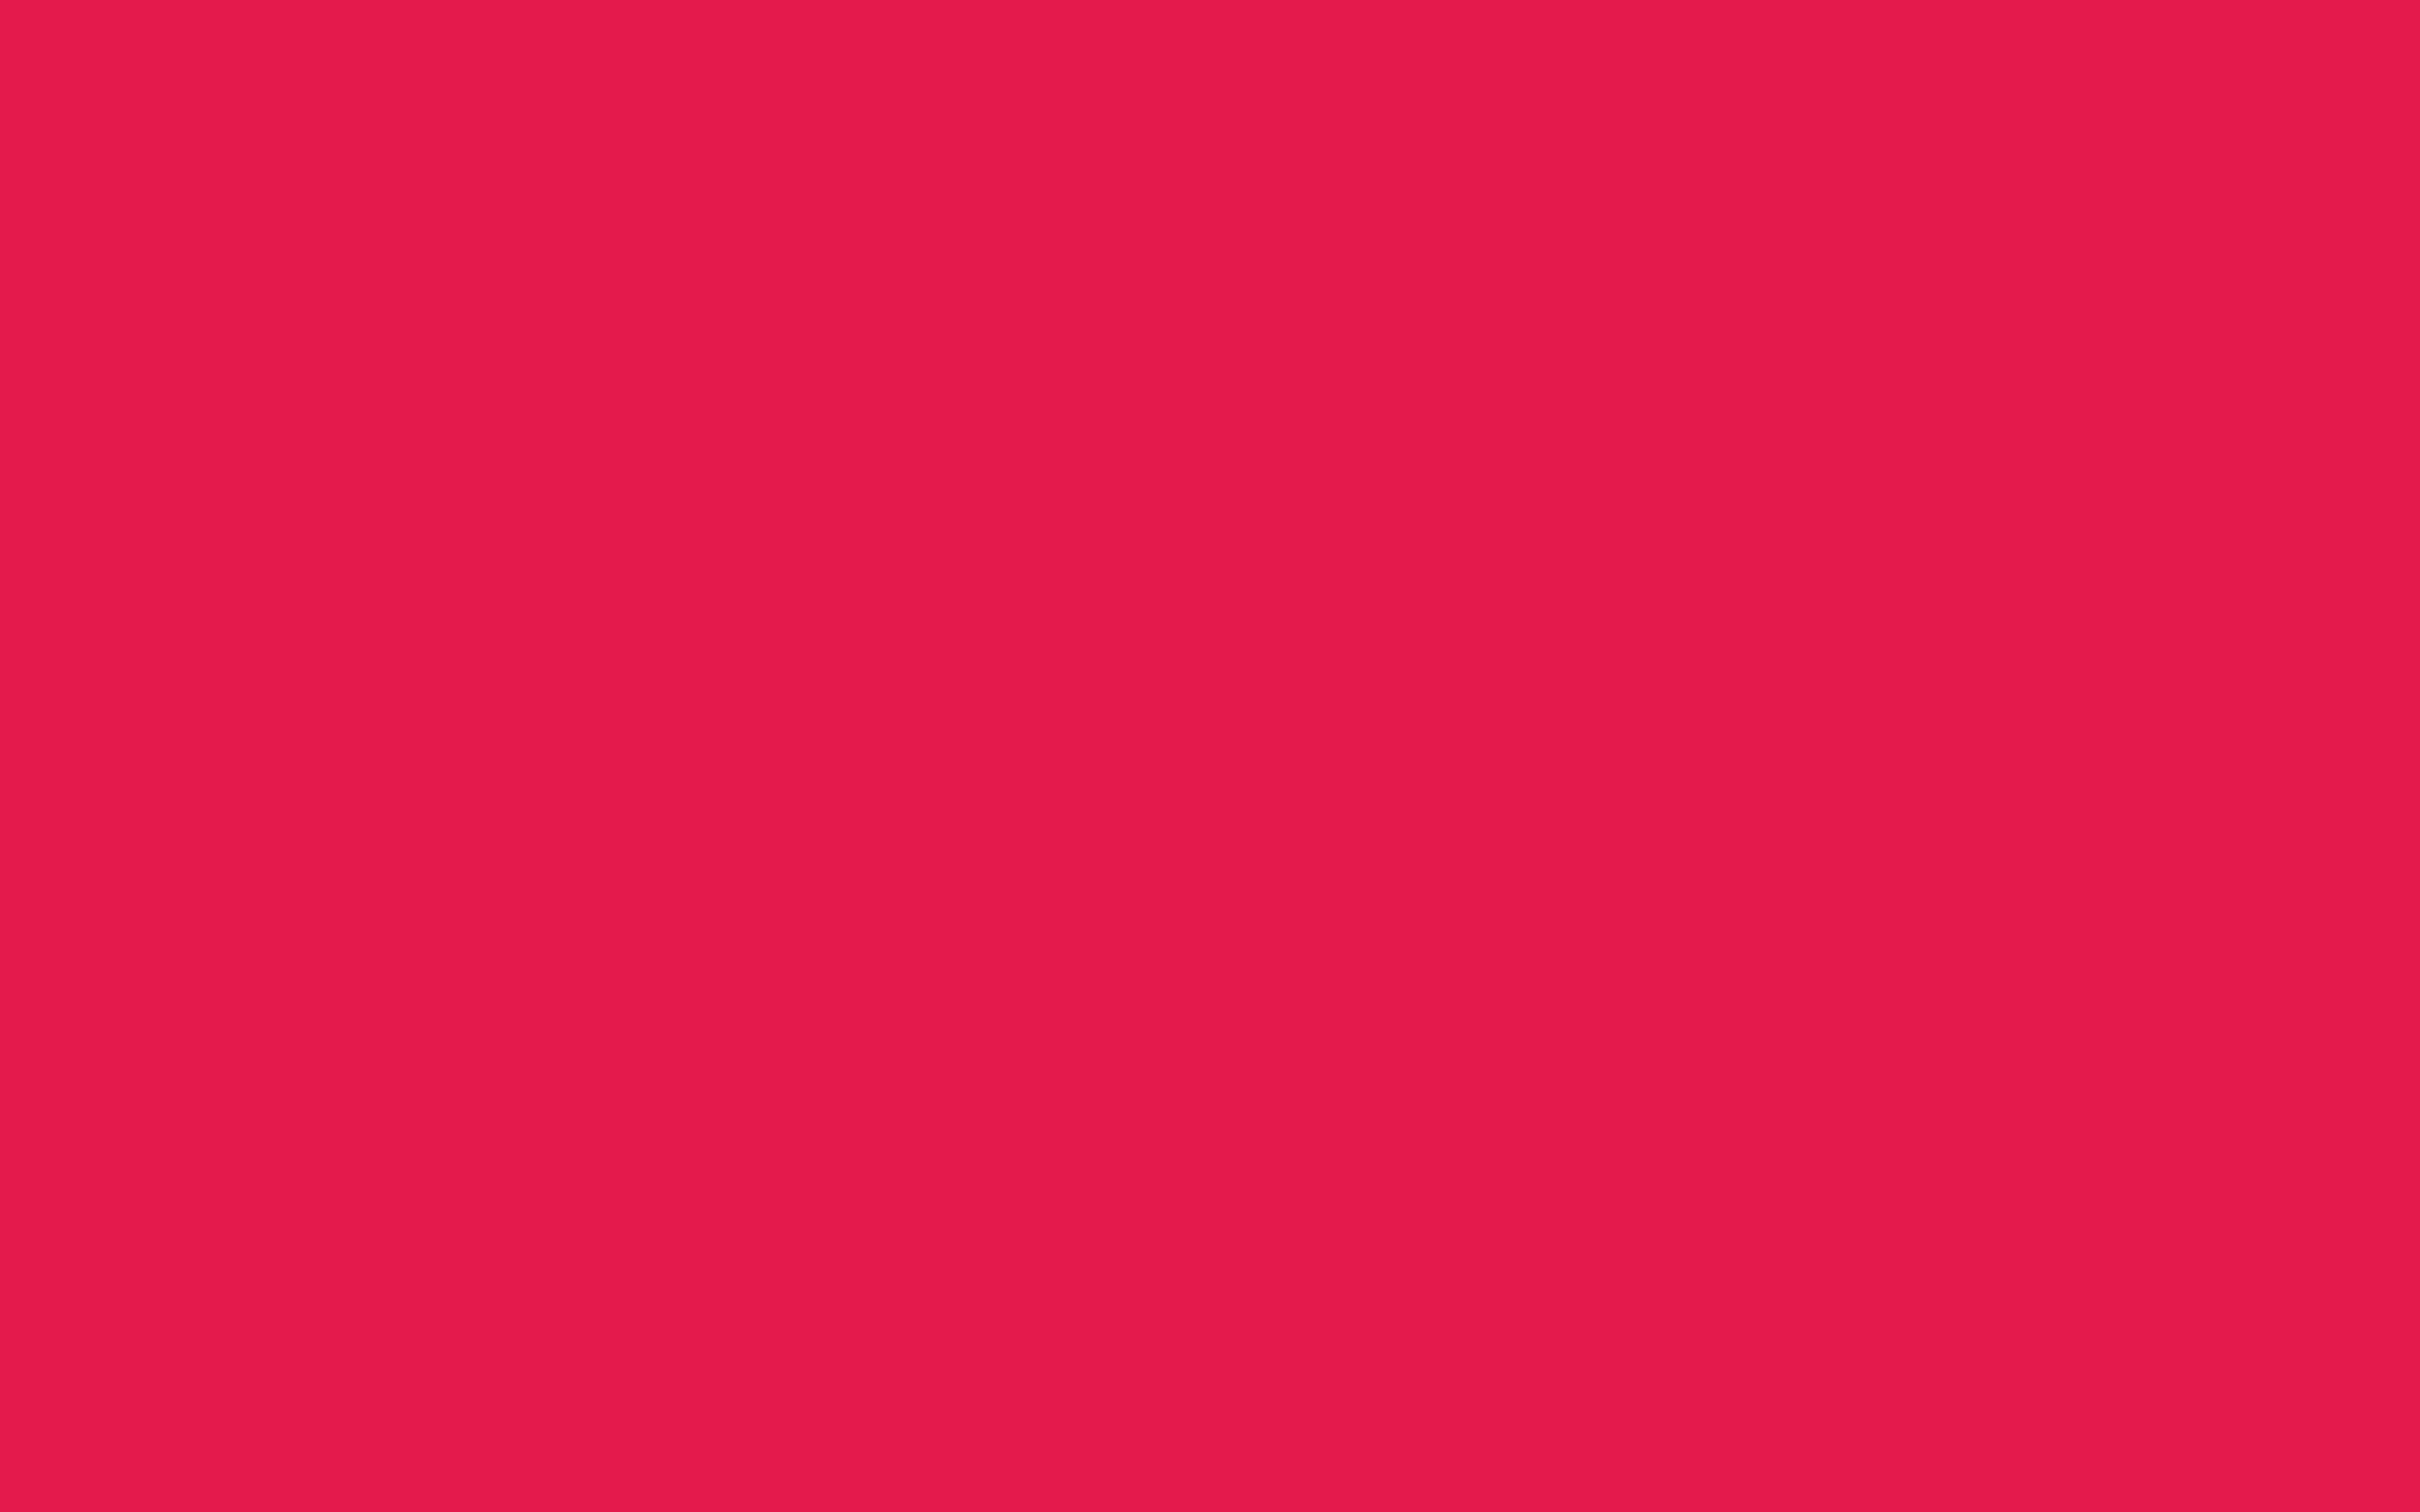 2560x1600 Spanish Crimson Solid Color Background